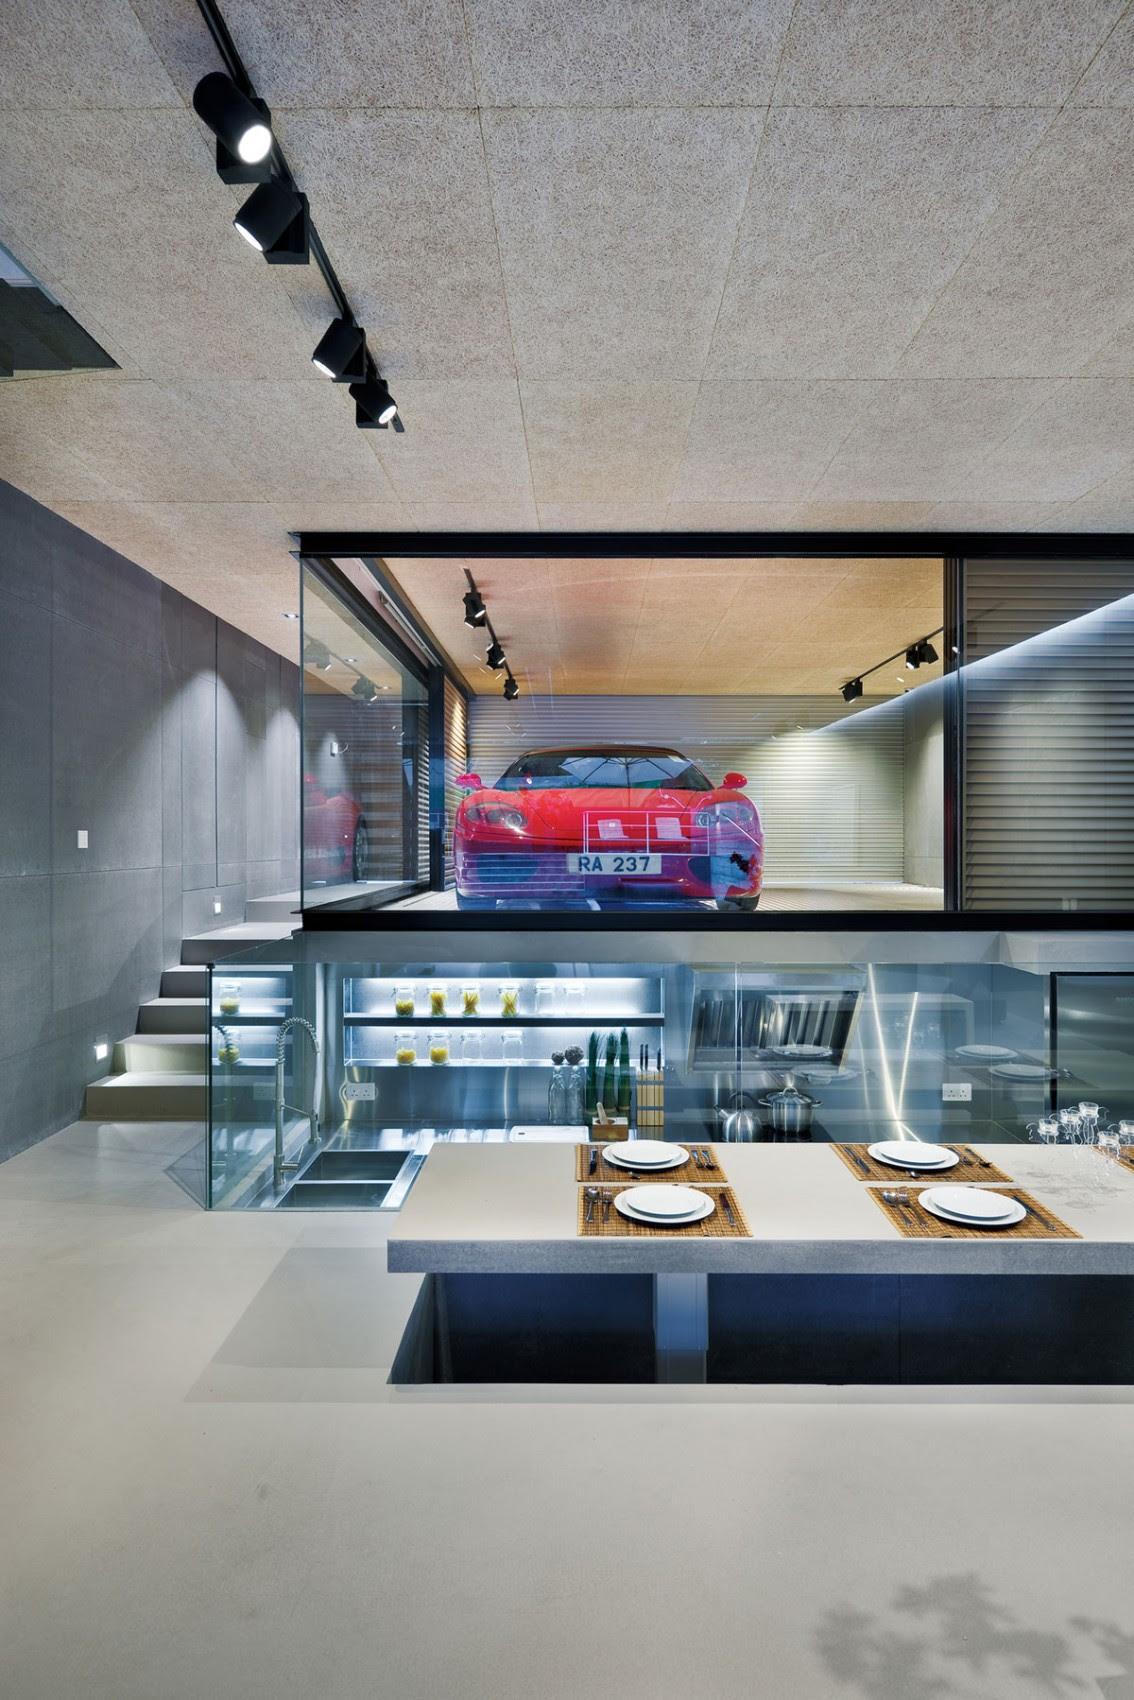 Modern Remodel in Hong Kong With A Ferrari As Focus